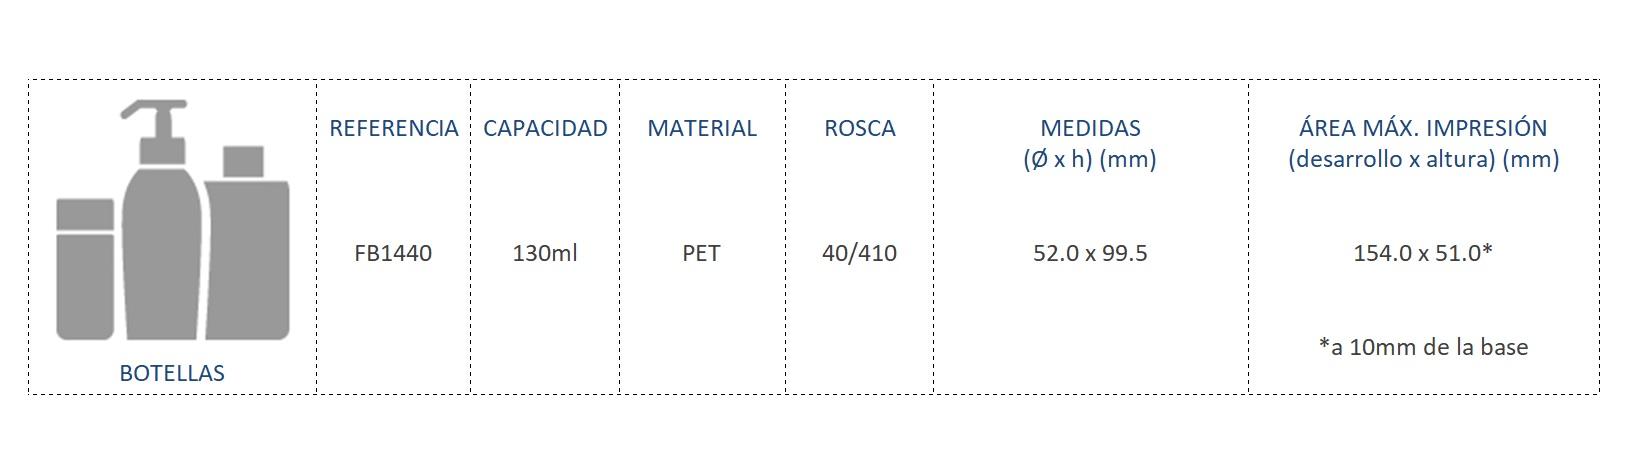 Cuadro de materiales botella FB1440